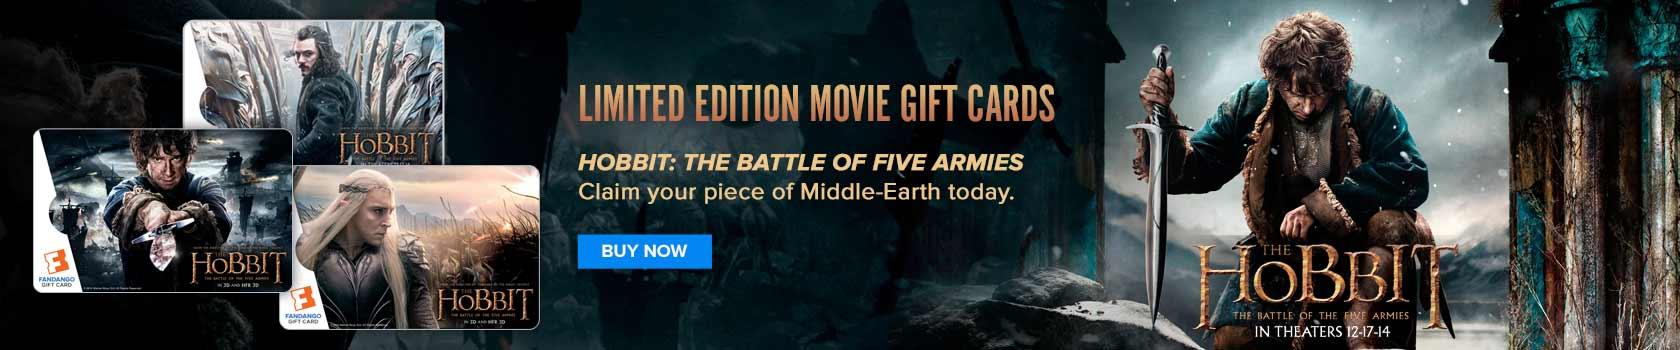 Hobbit 3 Gift Card